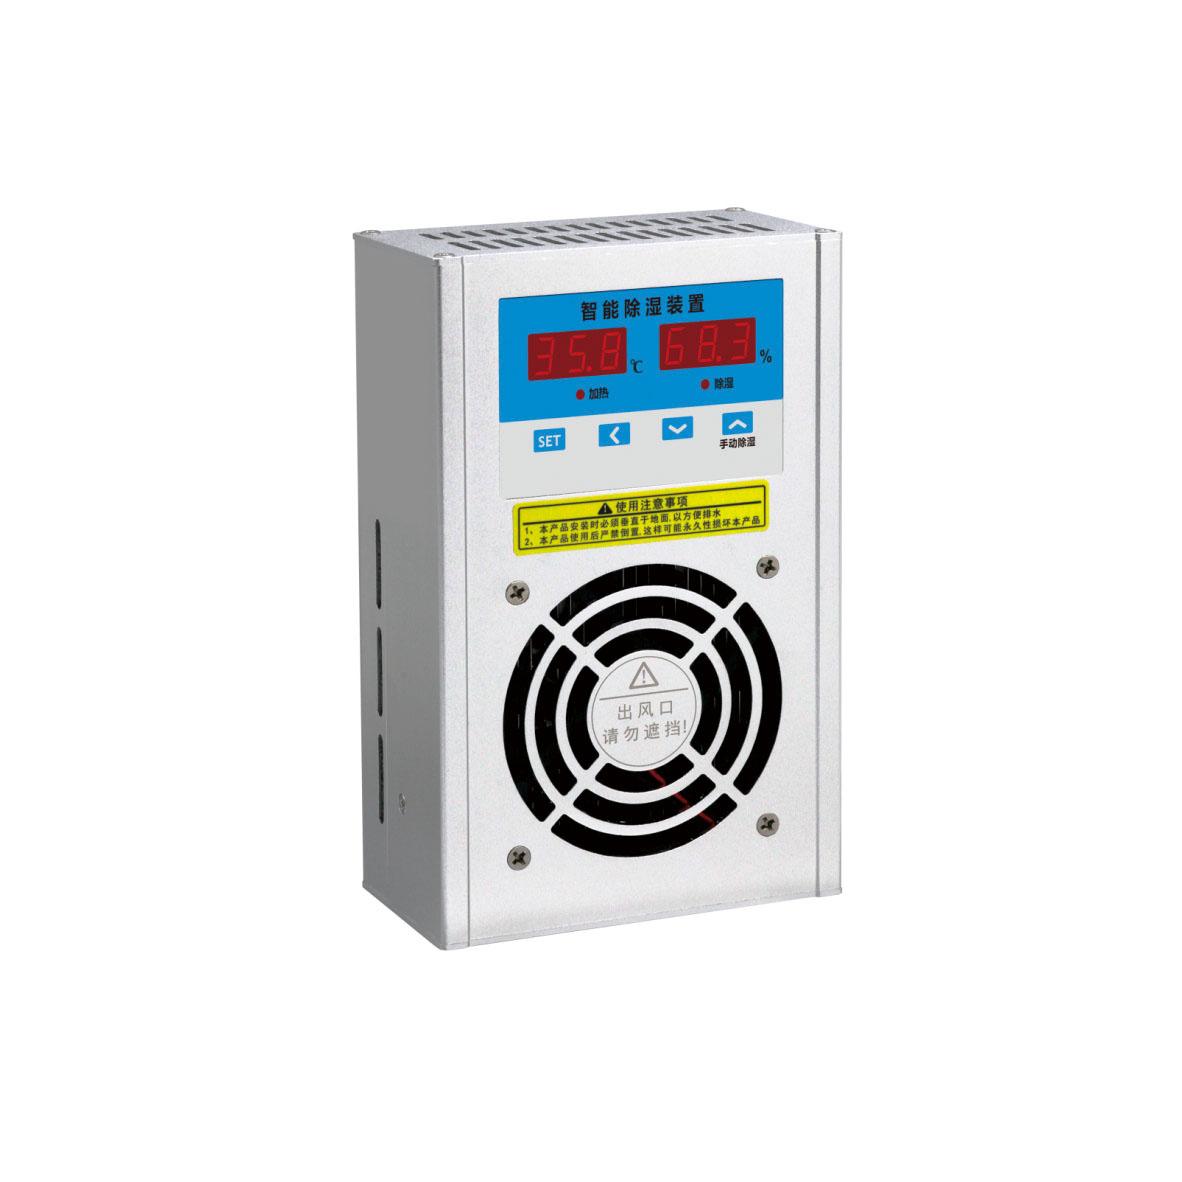 会理NAD-868RFG/450-20+20智能电容器大图